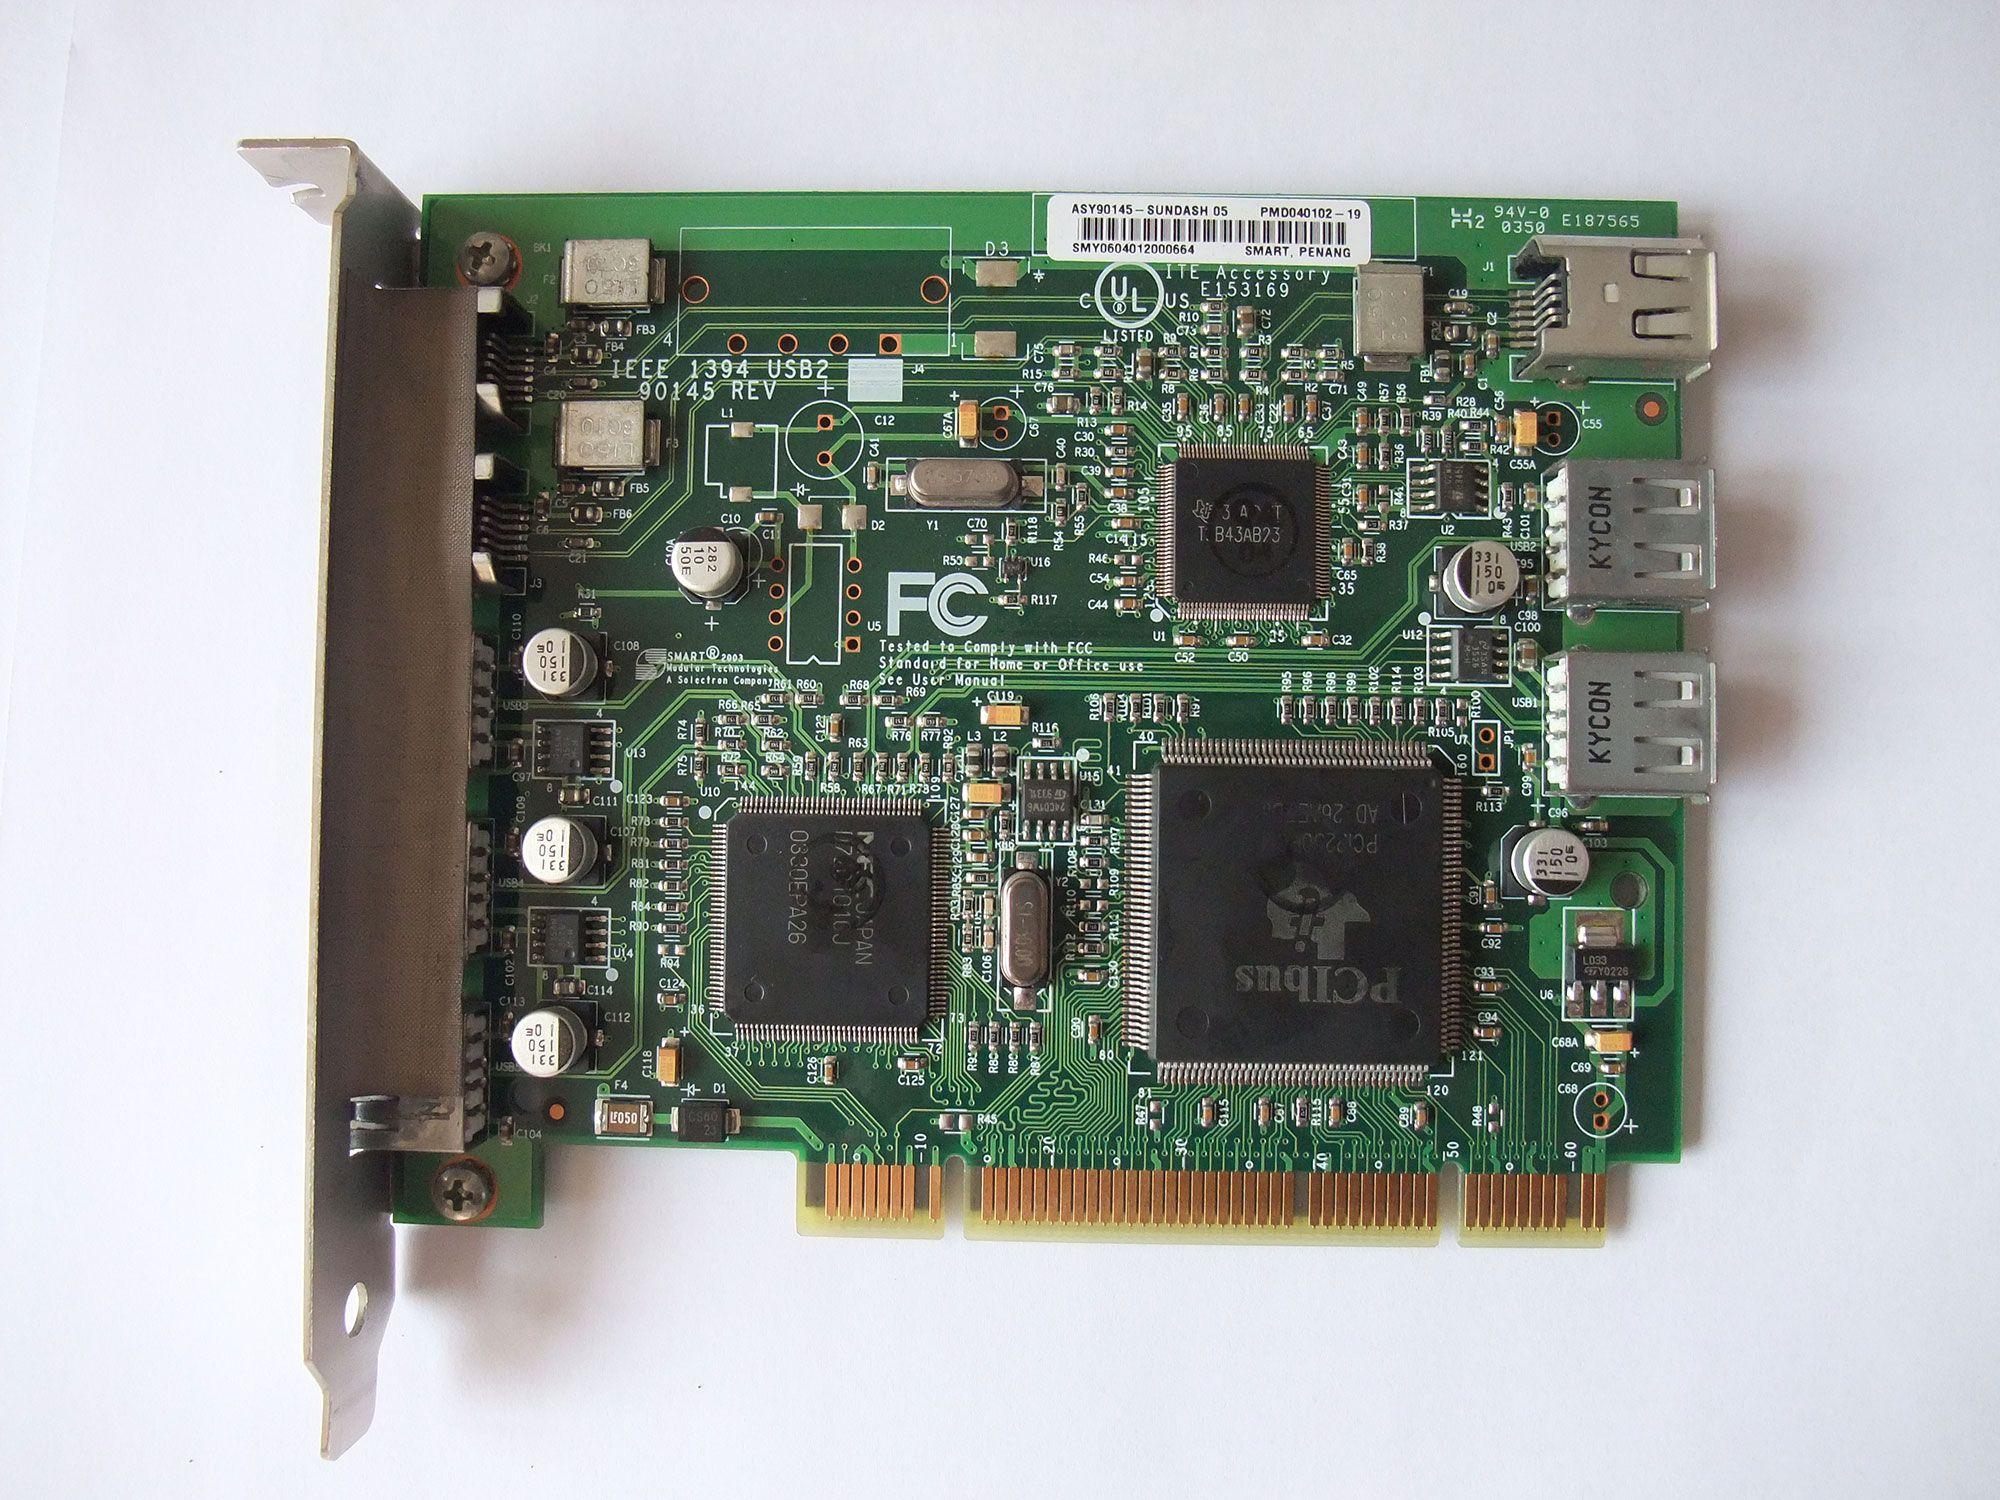 ADLINK Euresys Grablink Value Descargar Controlador